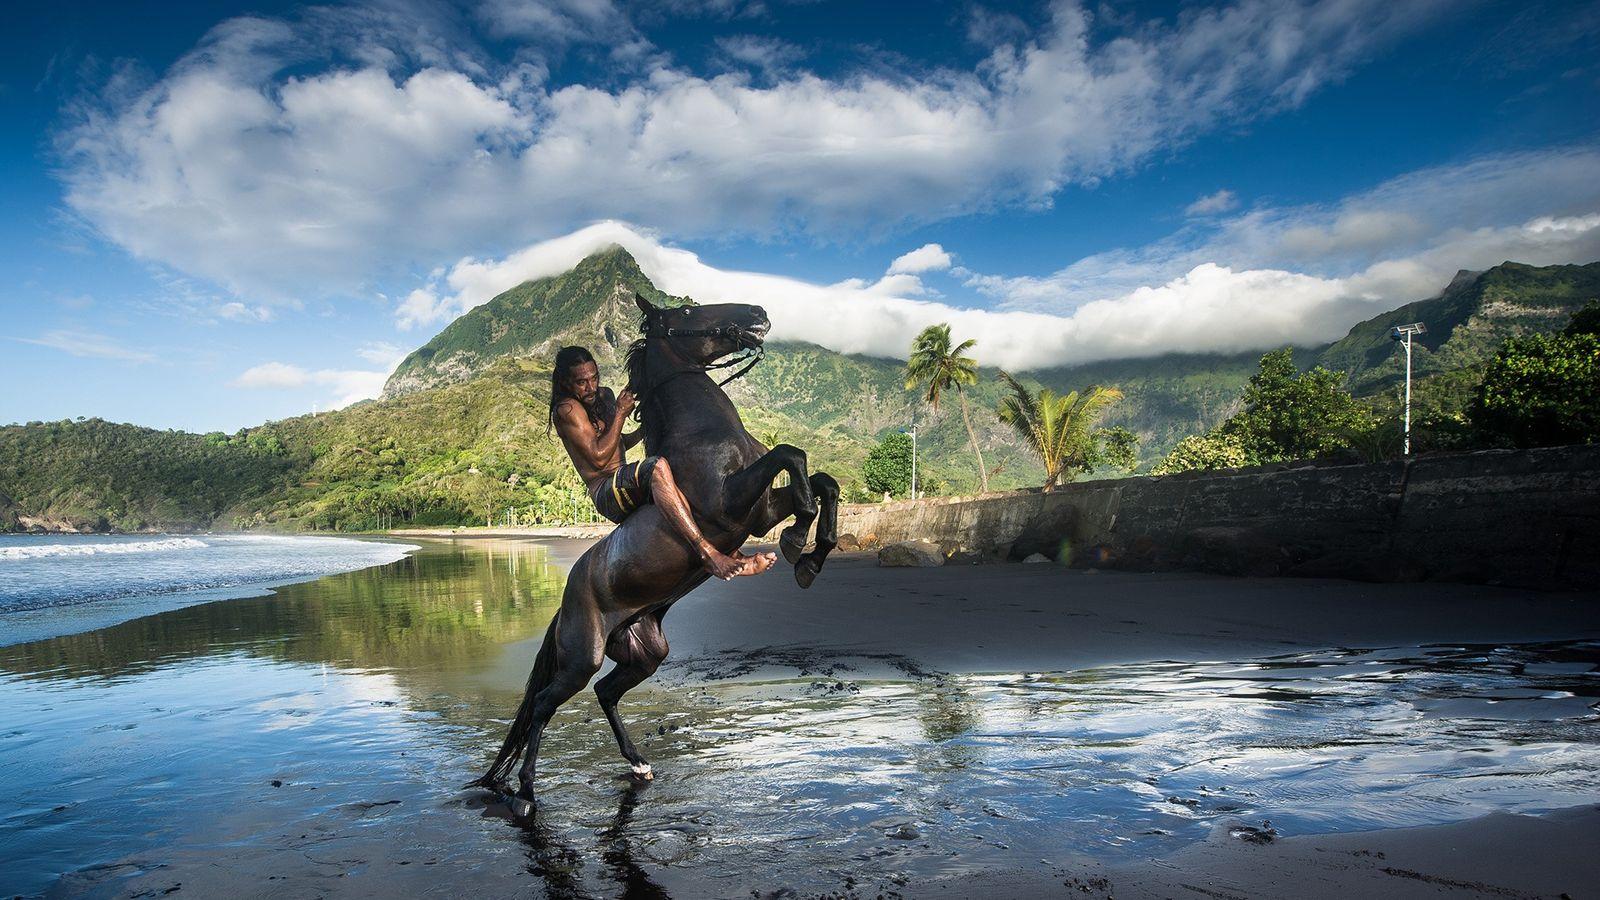 Jérémie Kehuehitu rises and dances with his horses on Hiva Oa's black sand beaches.